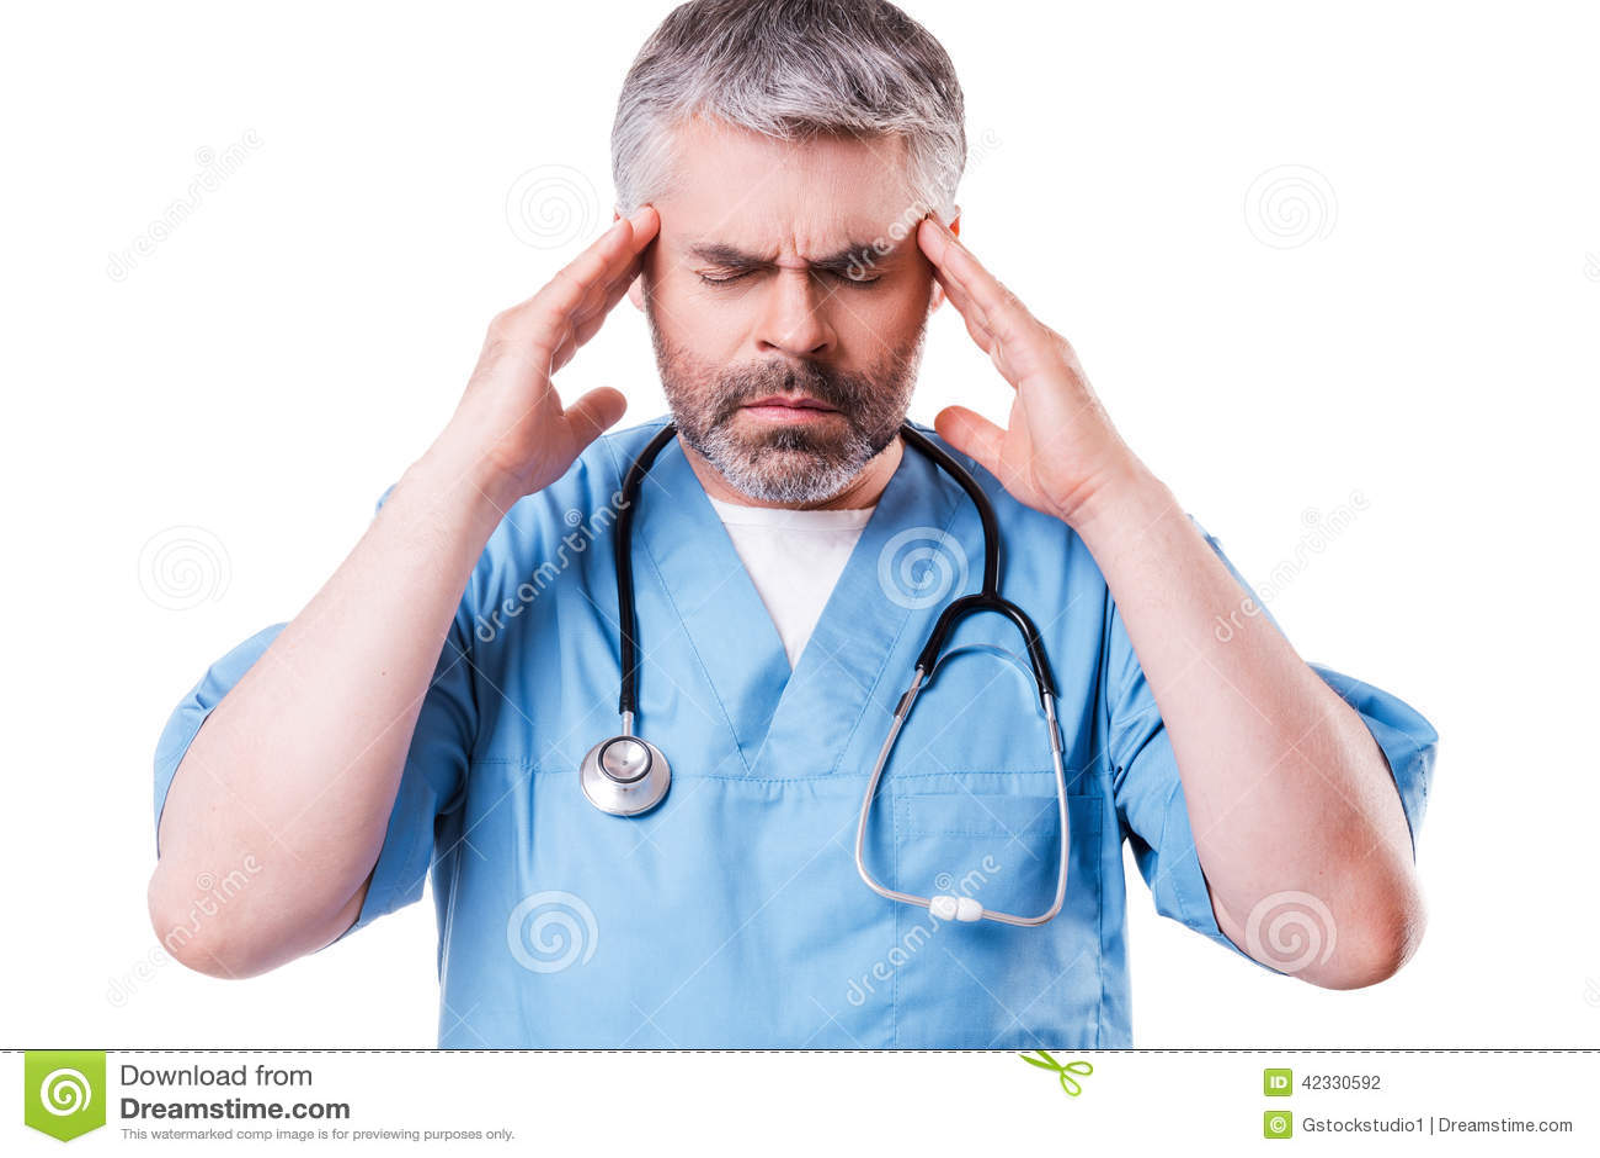 Stressed Surgeon. Stock Photo - Image: 42330592